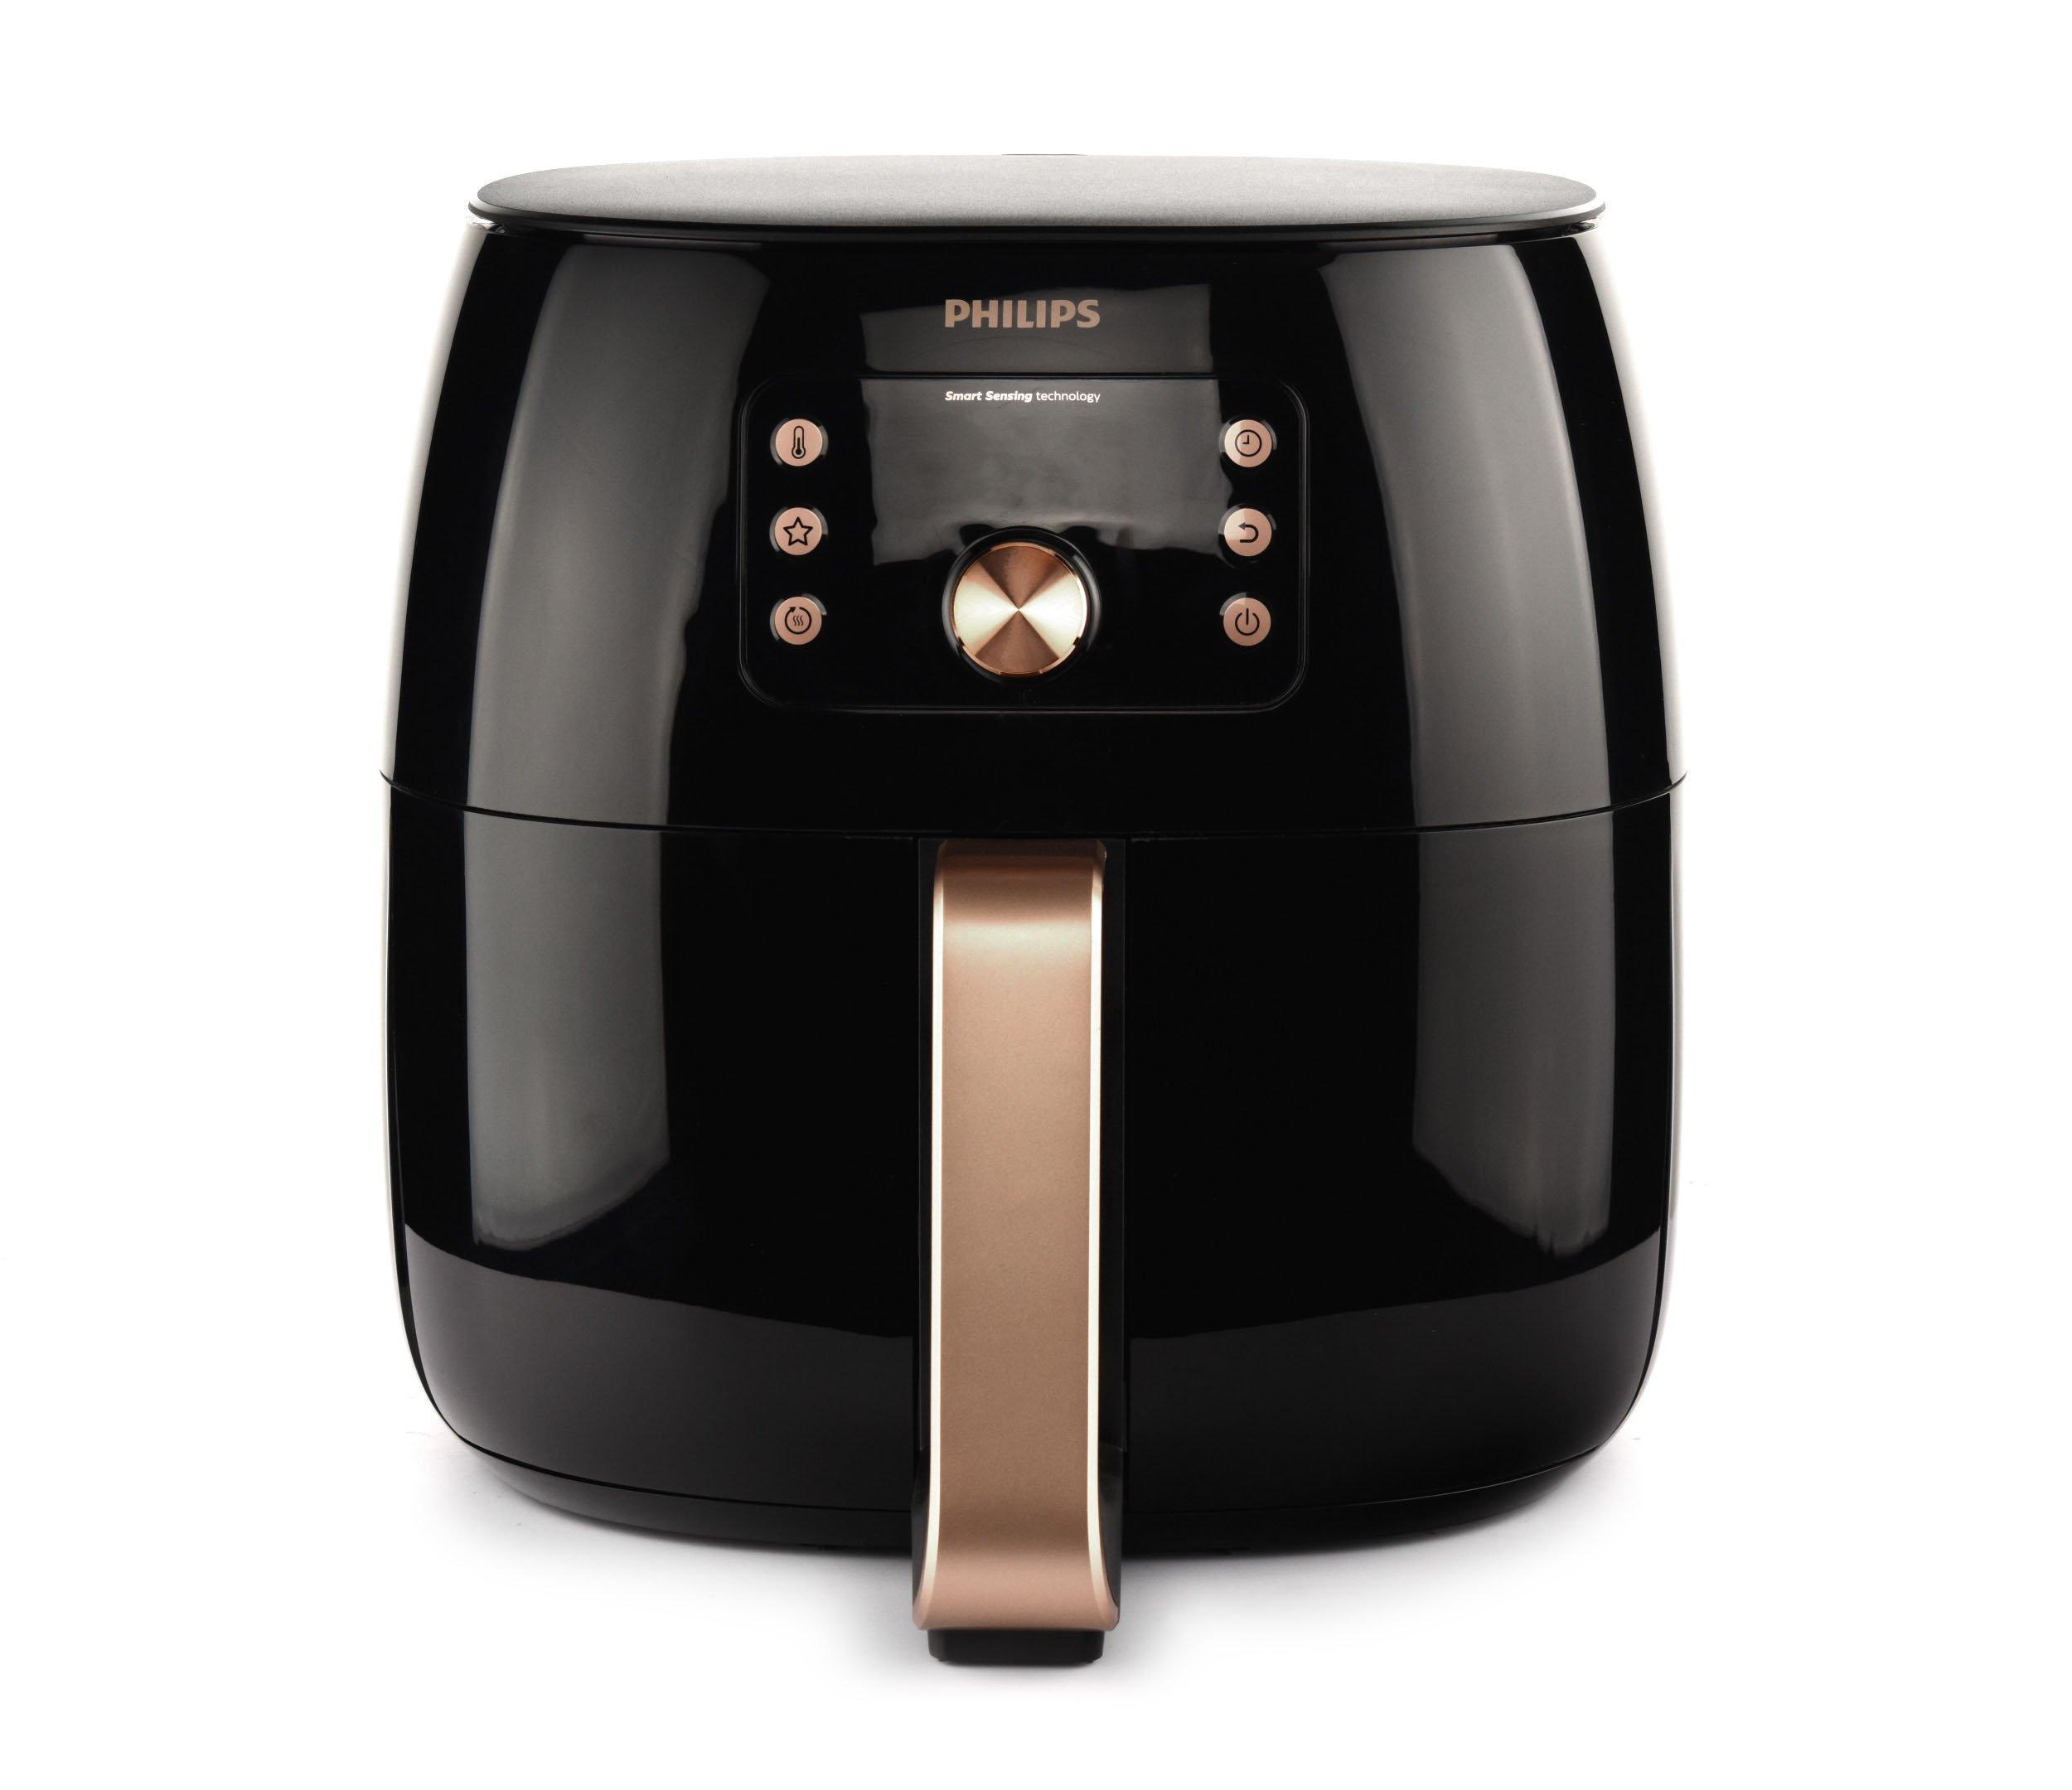 Philips Avance Airfryer Xxl 1 4kg Smart Sensor Technology Digital Black Copper Price In Saudi Arabia Extra Stores Saudi Arabia Kanbkam